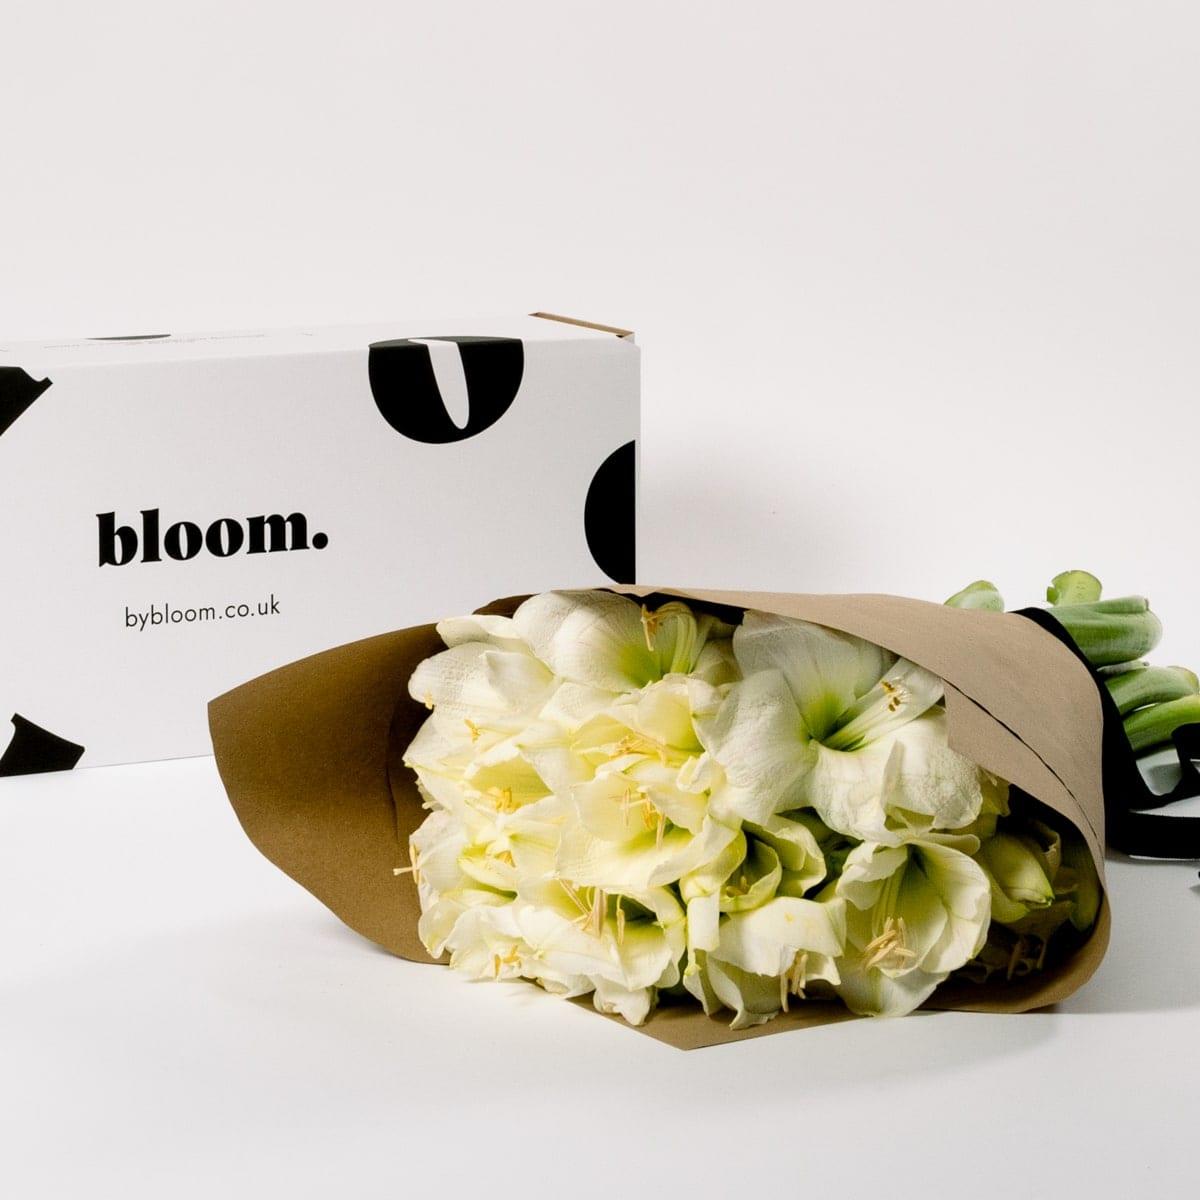 Bloom Flower Delivery | Polar White Amaryllis